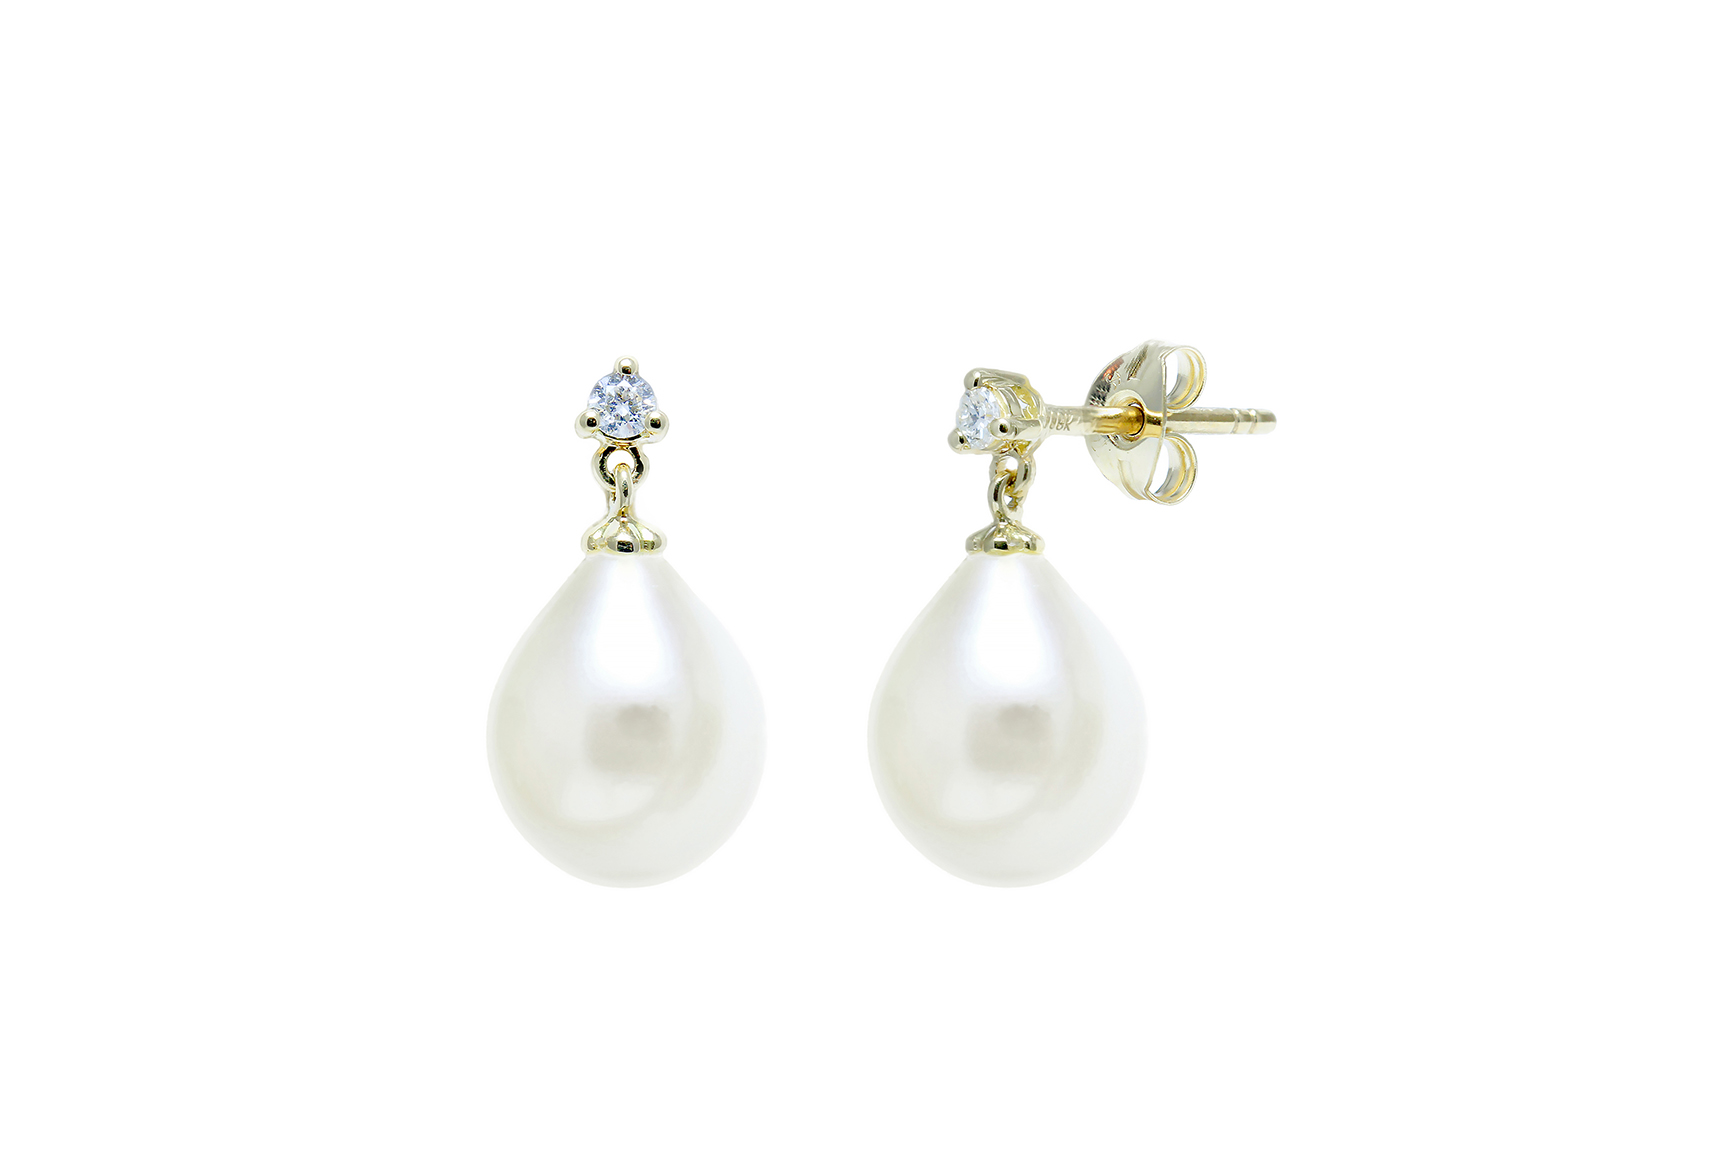 18ct yellow gold diamond set earrings with 9mm+ freshwater teardrop pearls